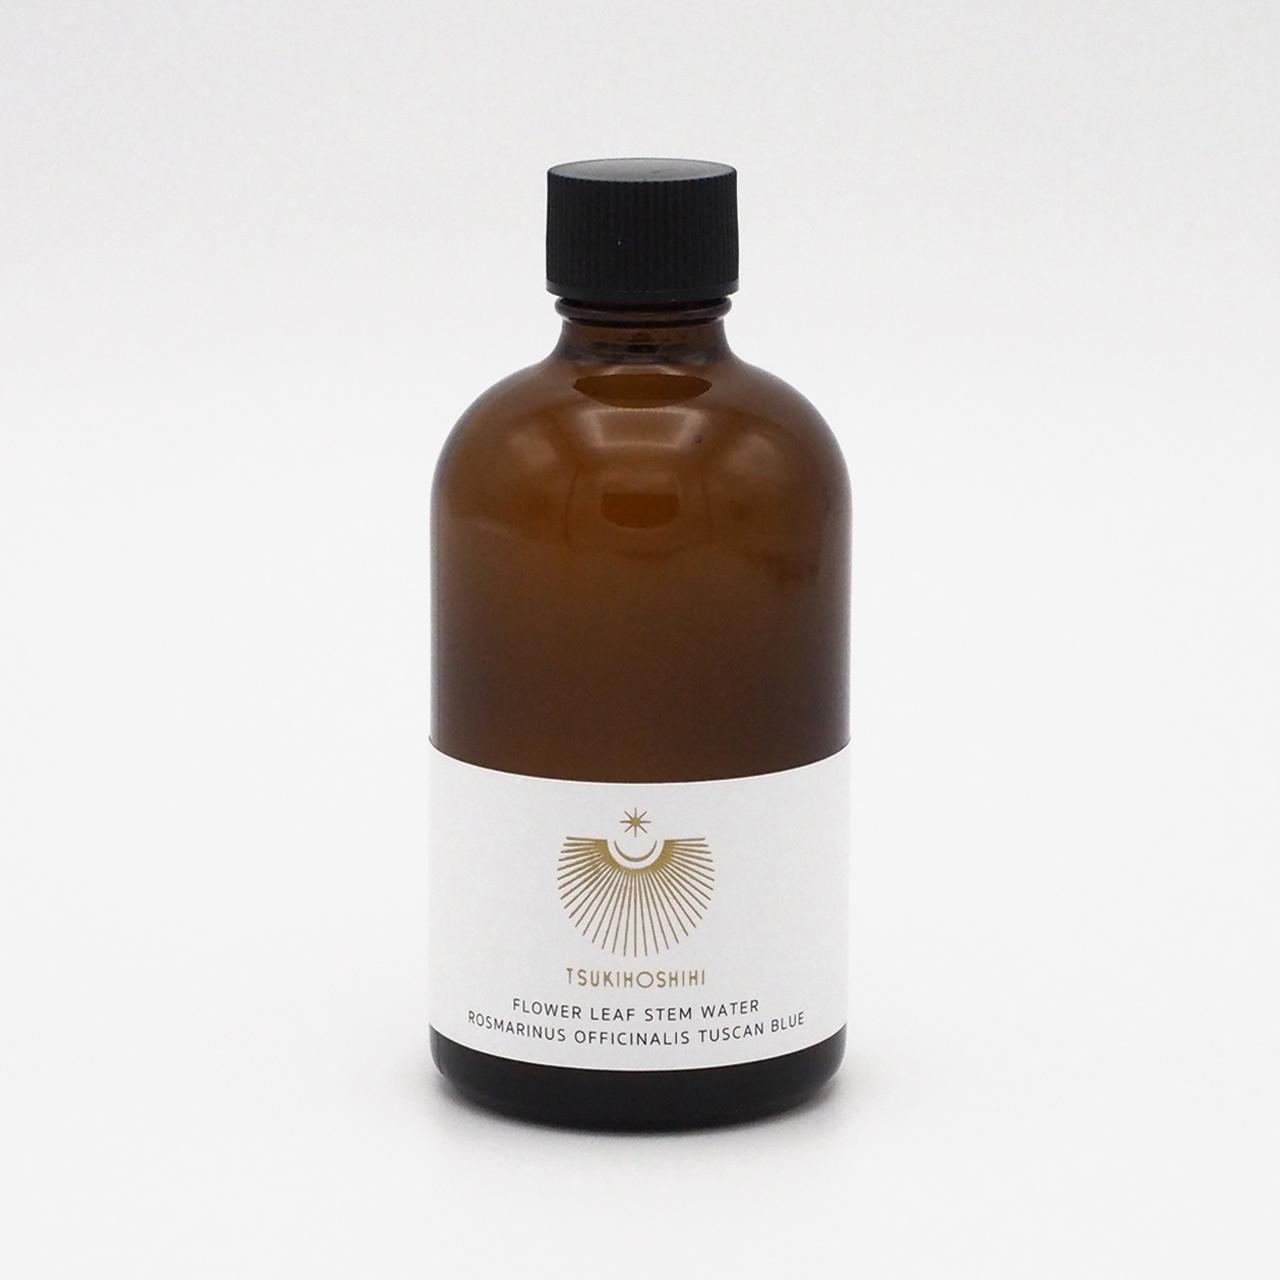 100% Pure Essential Water Rosmarinus Officinalis Tuscan Blue/ ローズマリートスカーナブルー  エッセンシャルウォーター 100ml